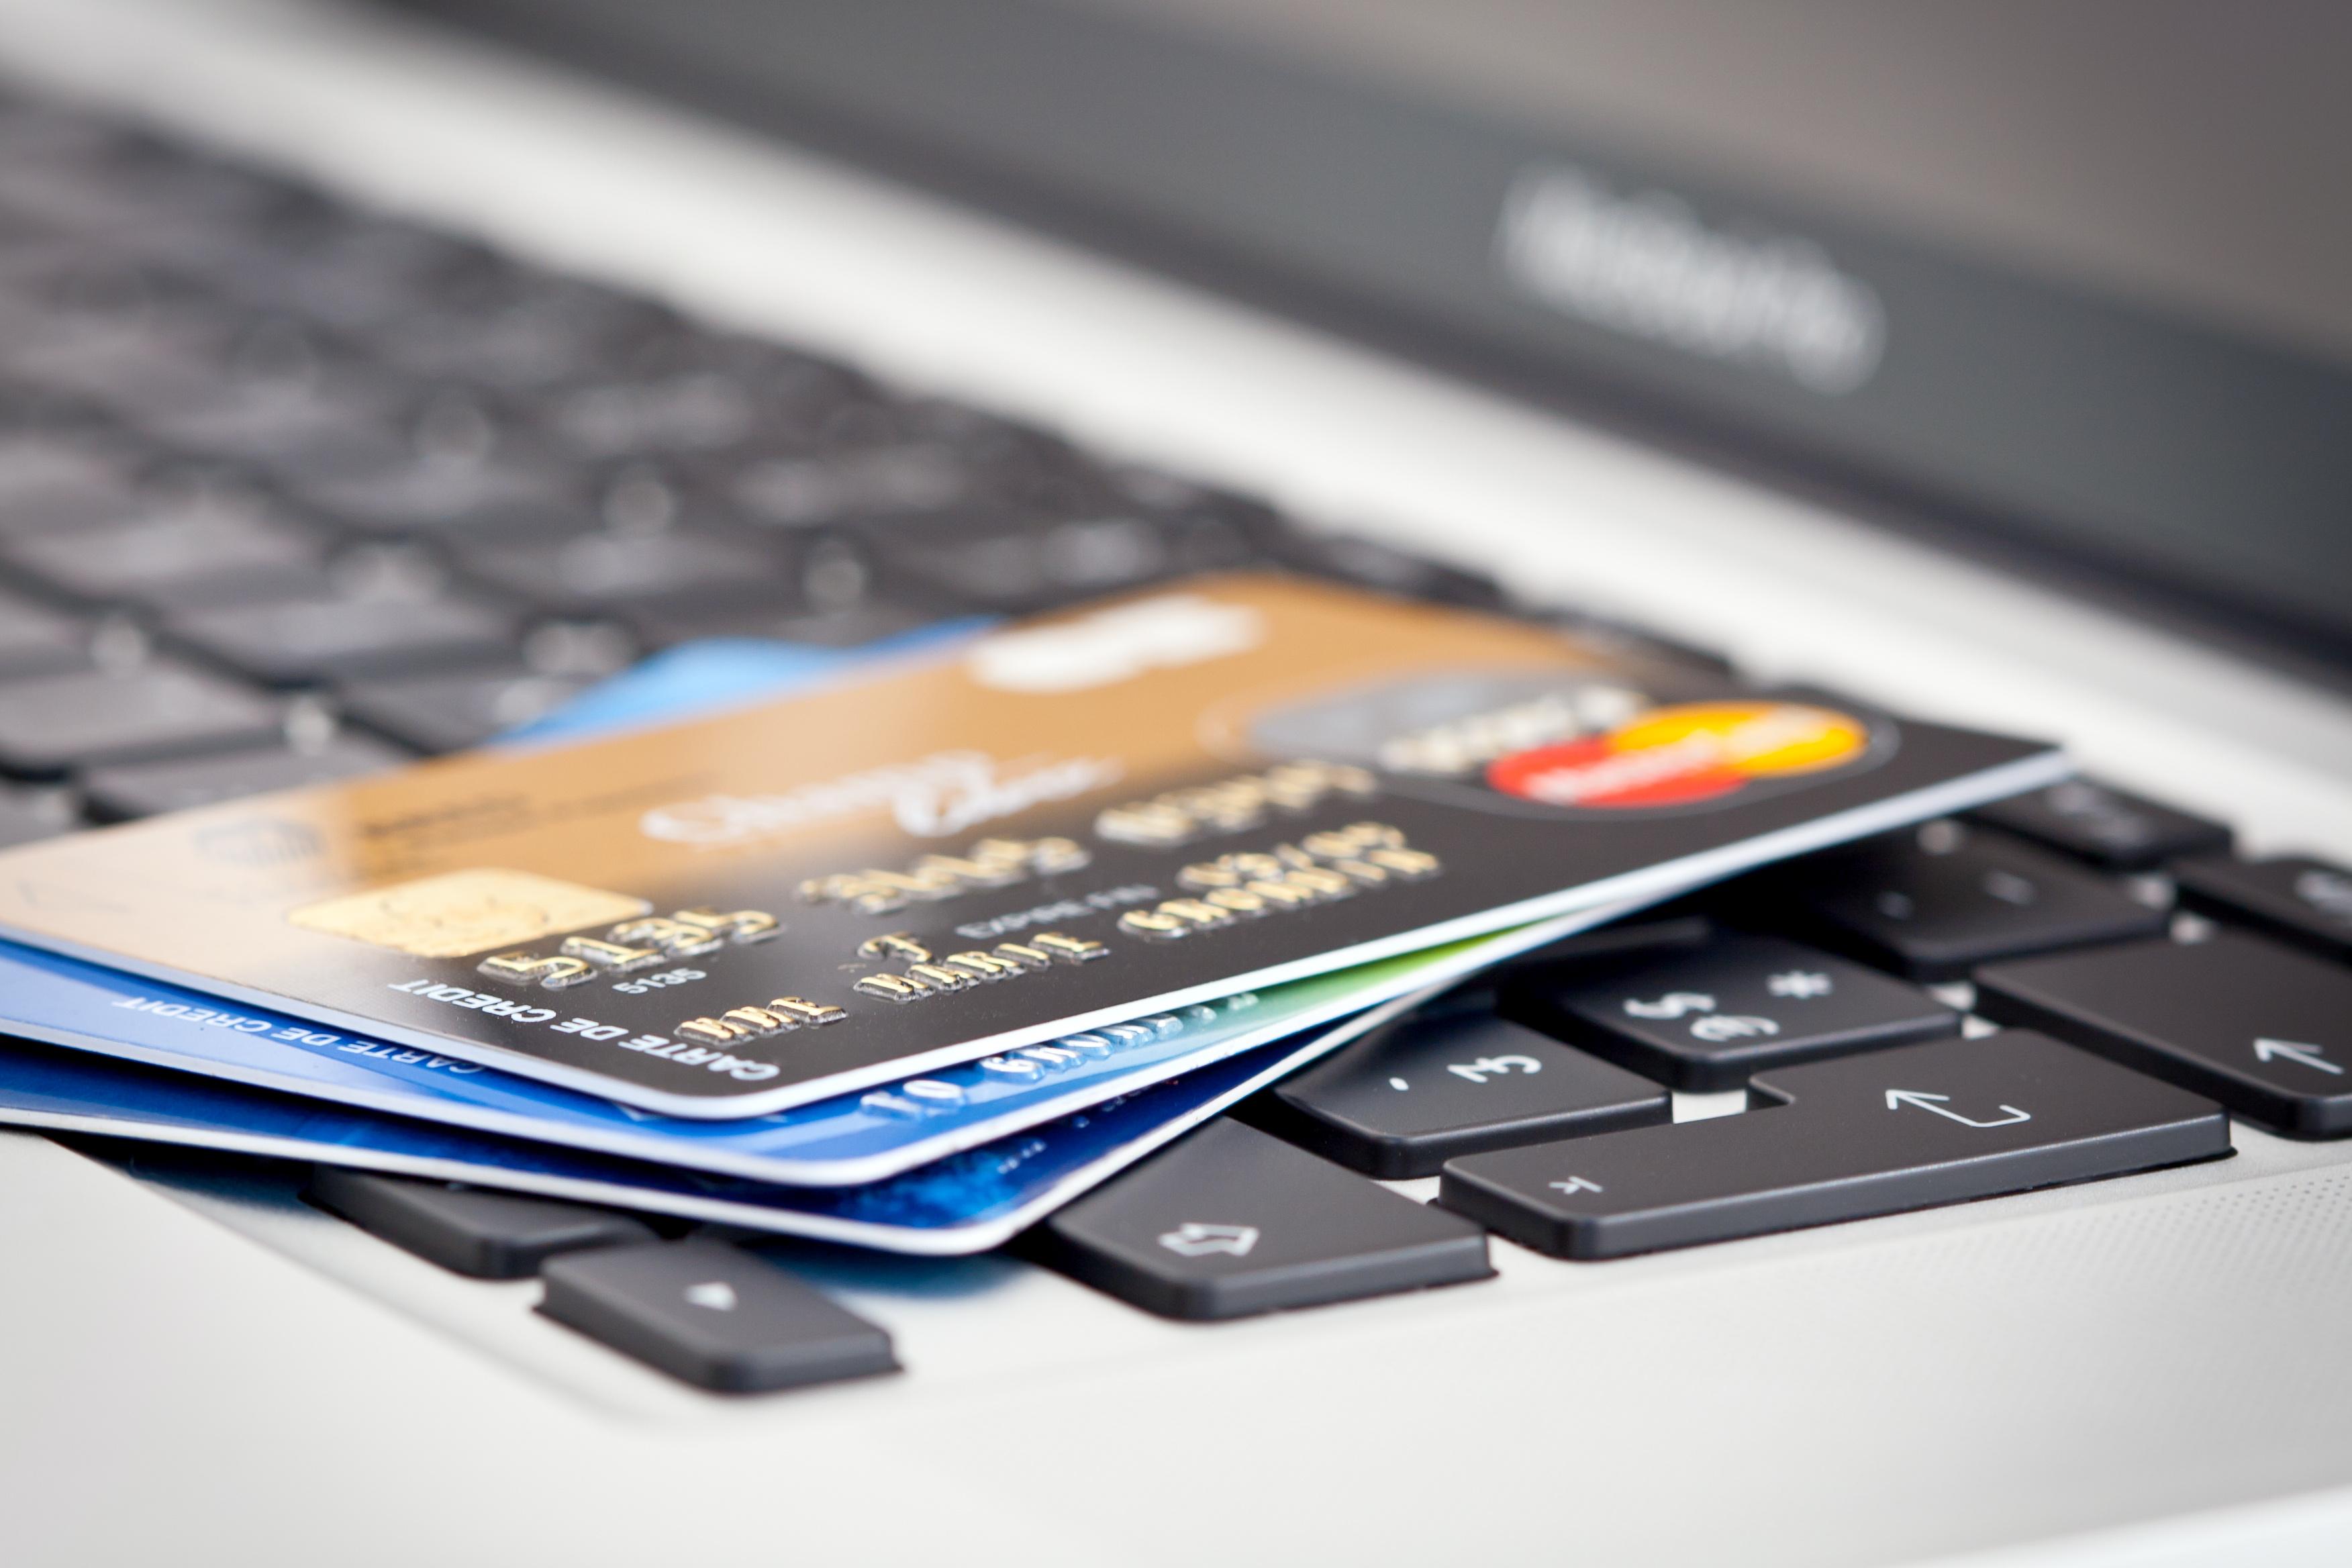 richtige Kreditkarte